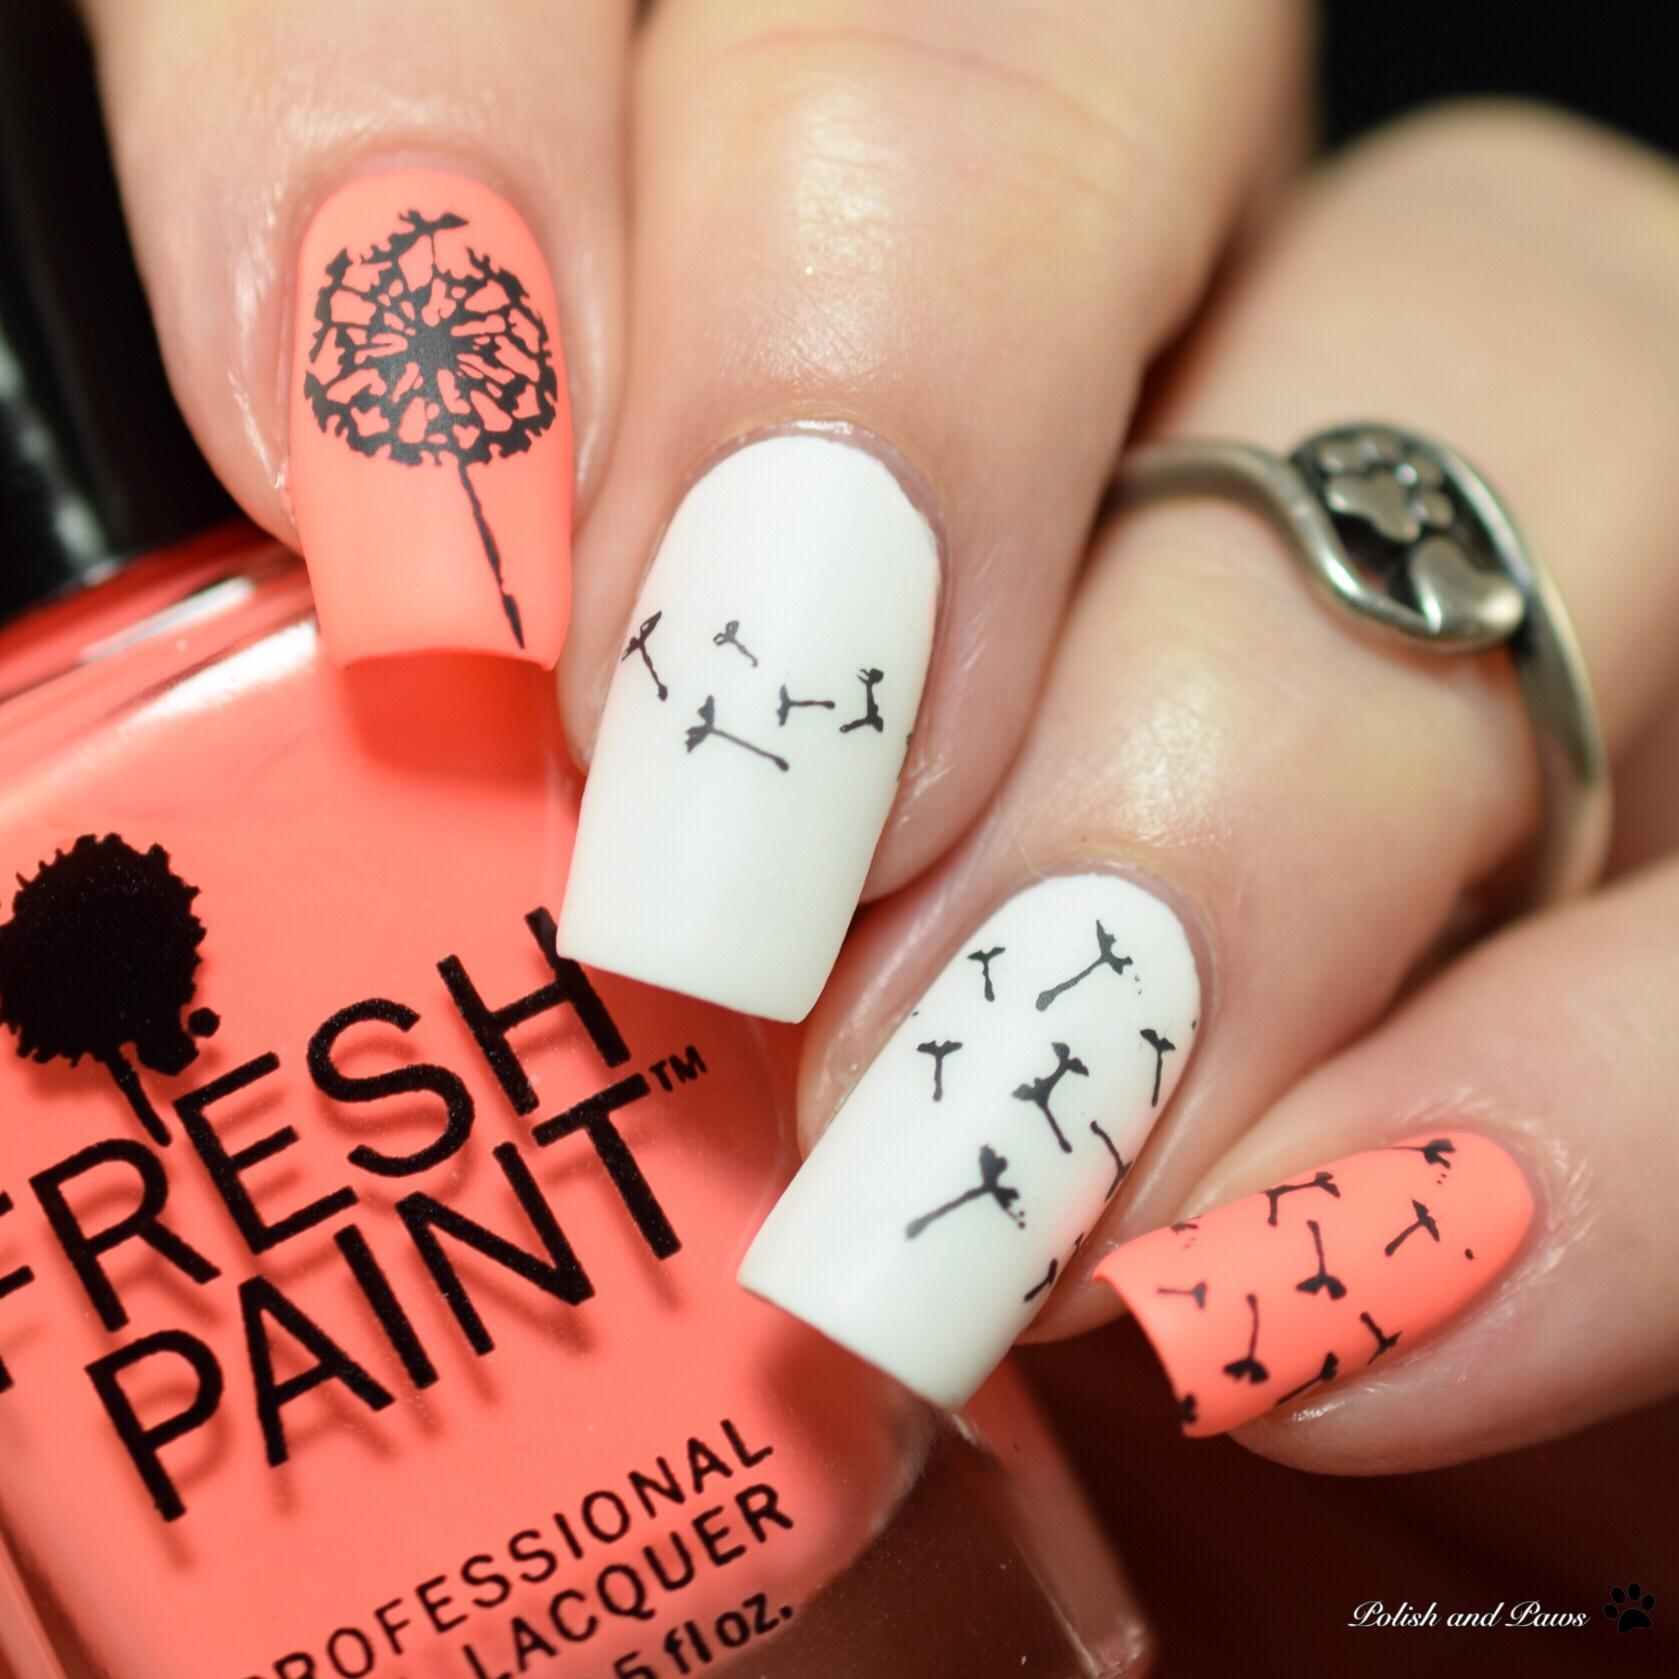 Nail Art ~ Dandelions | Polish and Paws